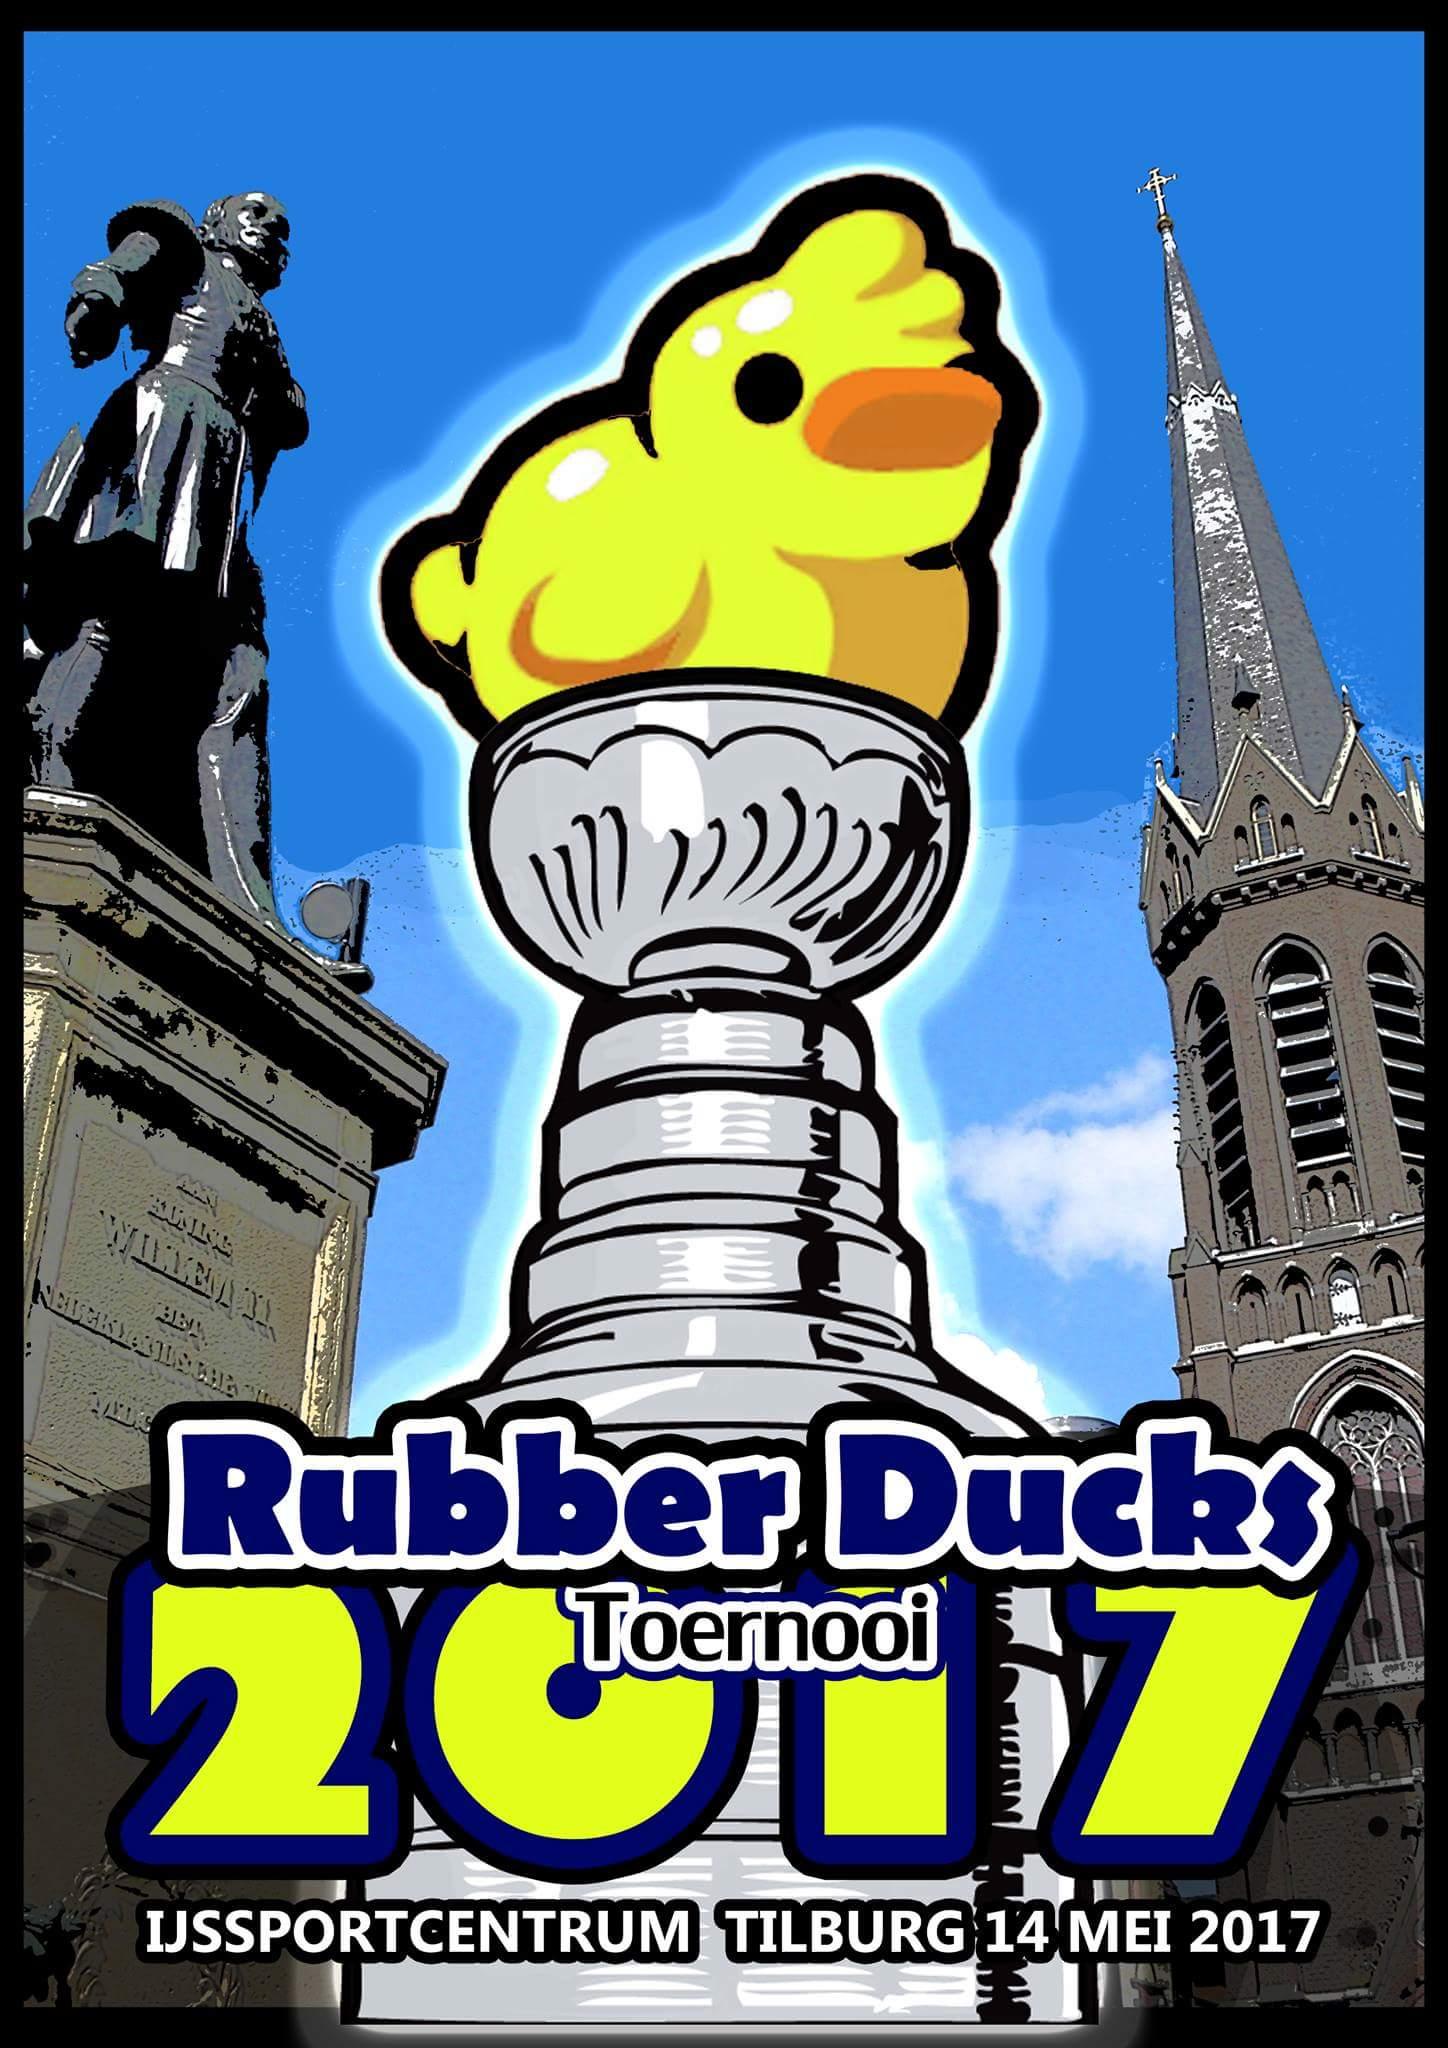 Rubberducks toernooi